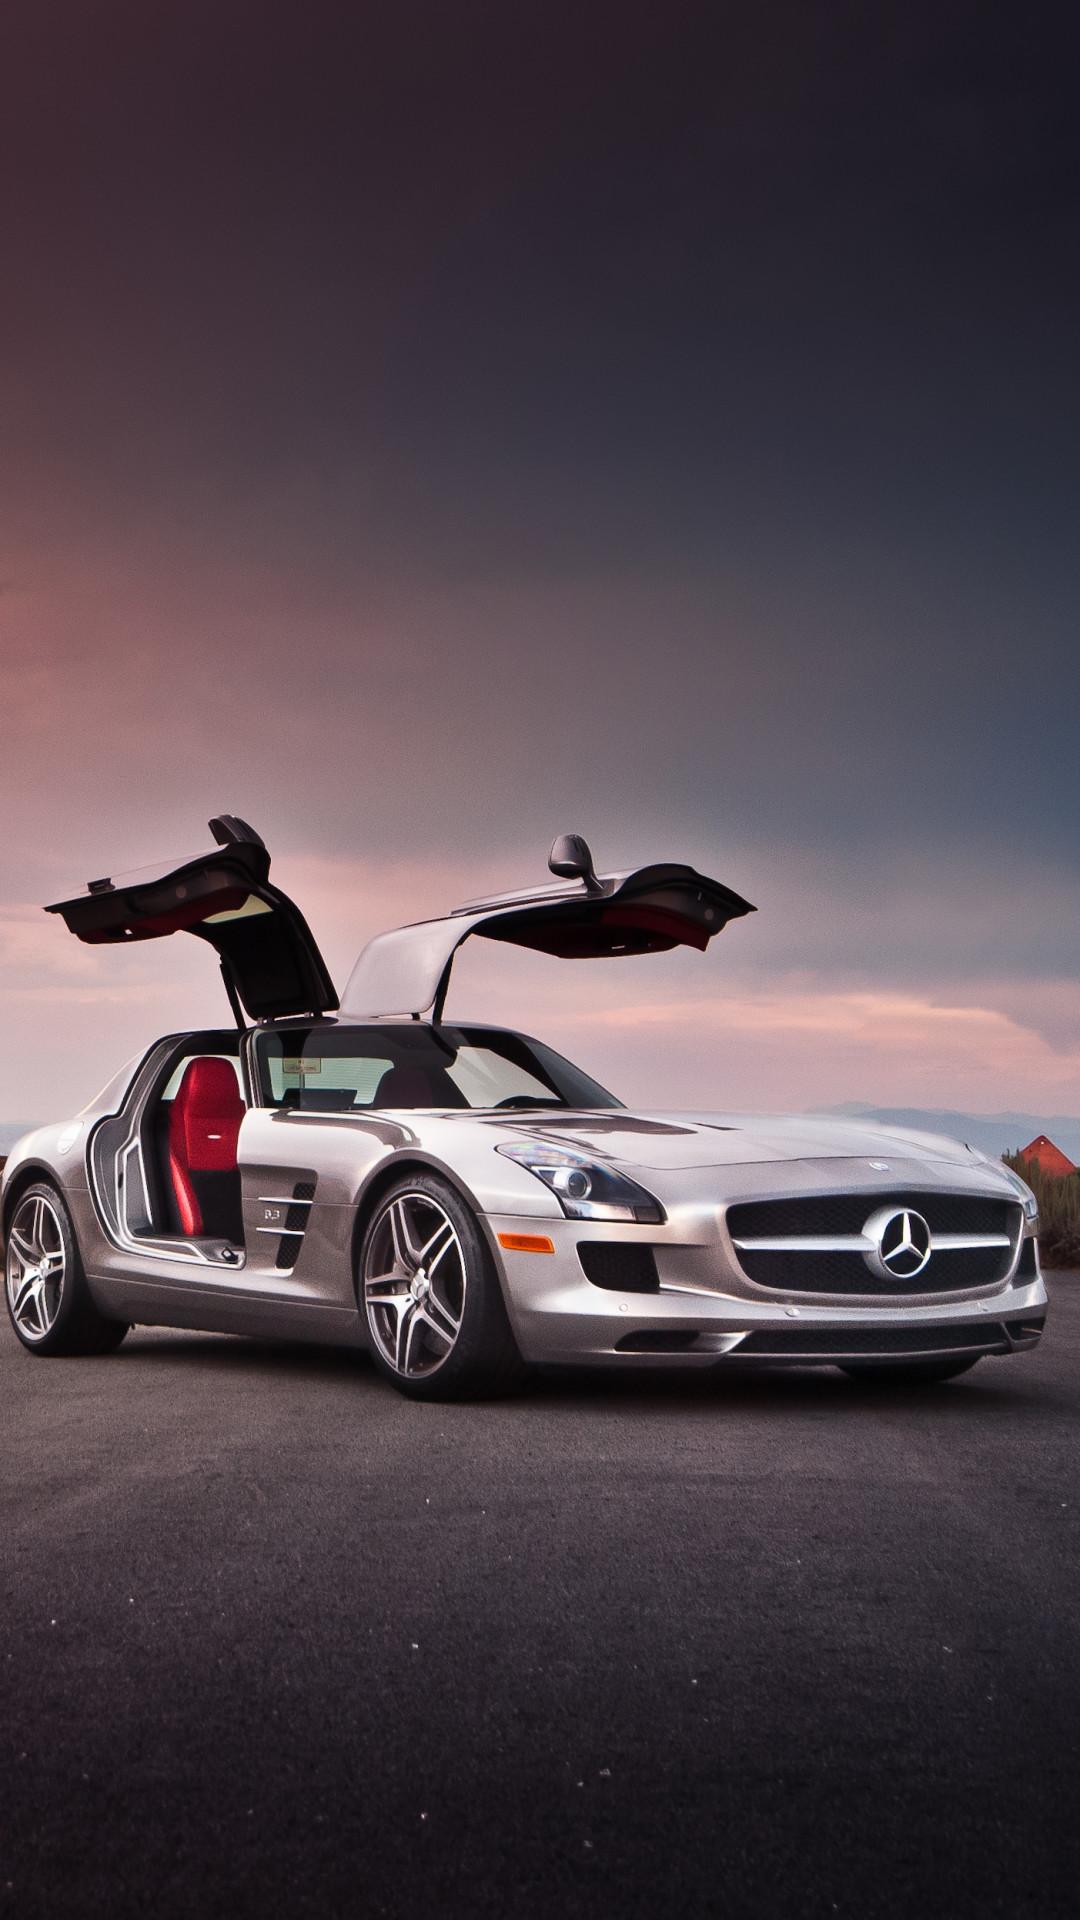 Mercedes Benz Amg Wallpaper (75+ pictures)